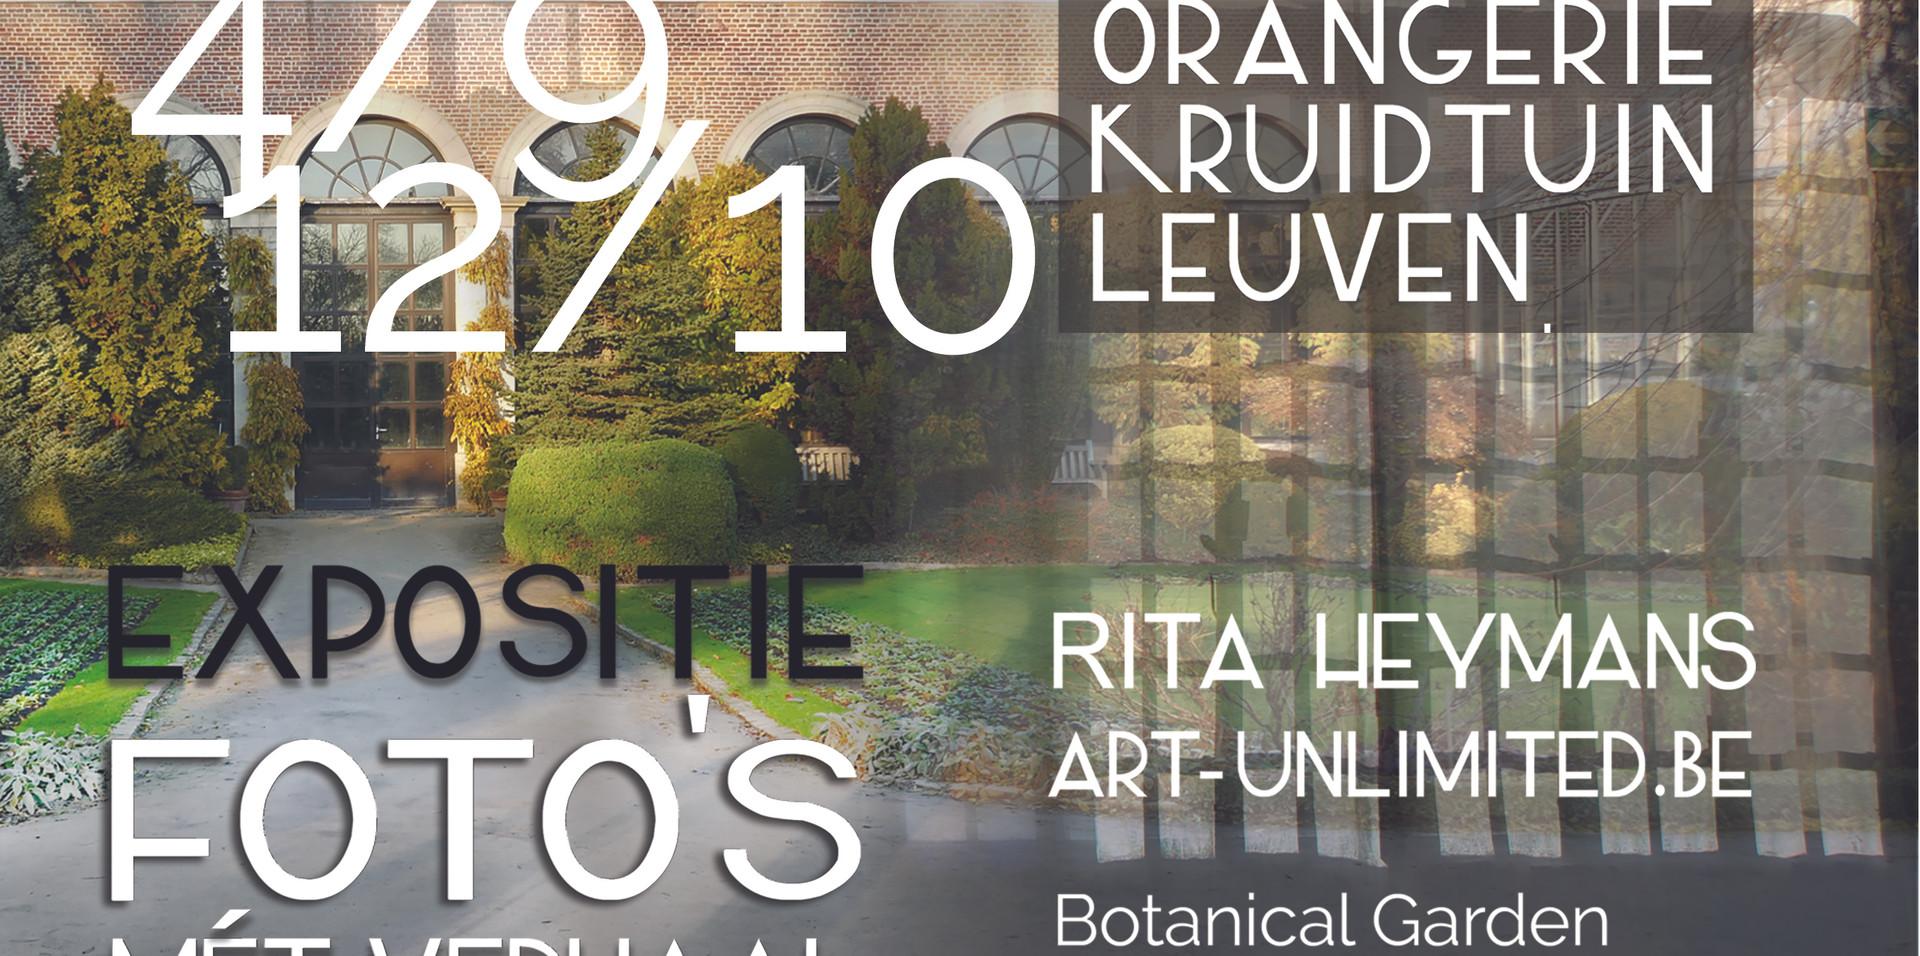 cover-catalogus-orangerie+kopie.jpg